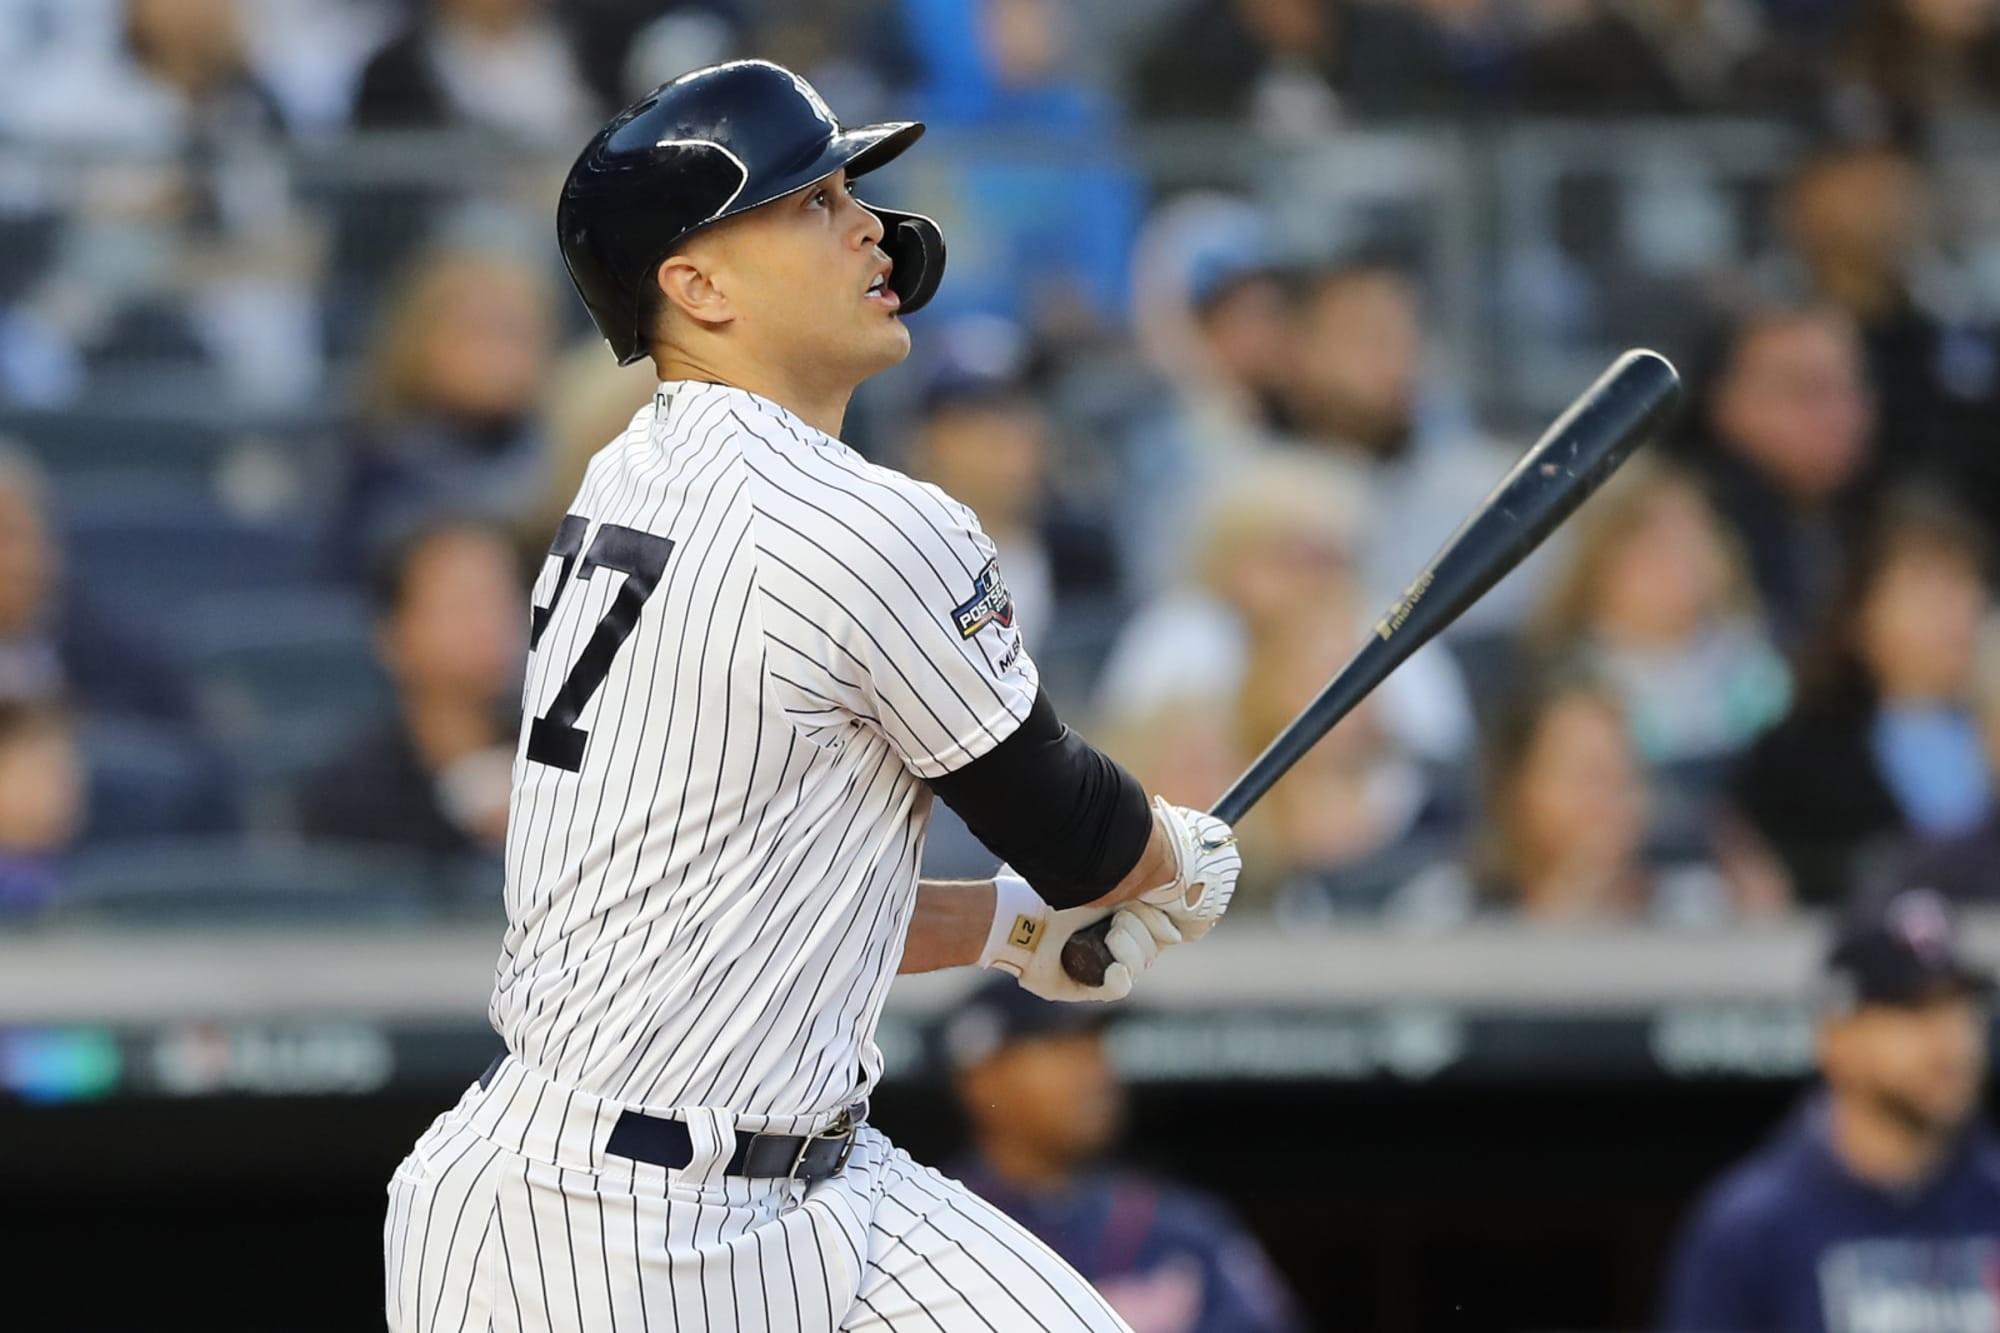 This swing change has Yankees Giancarlo Stanton